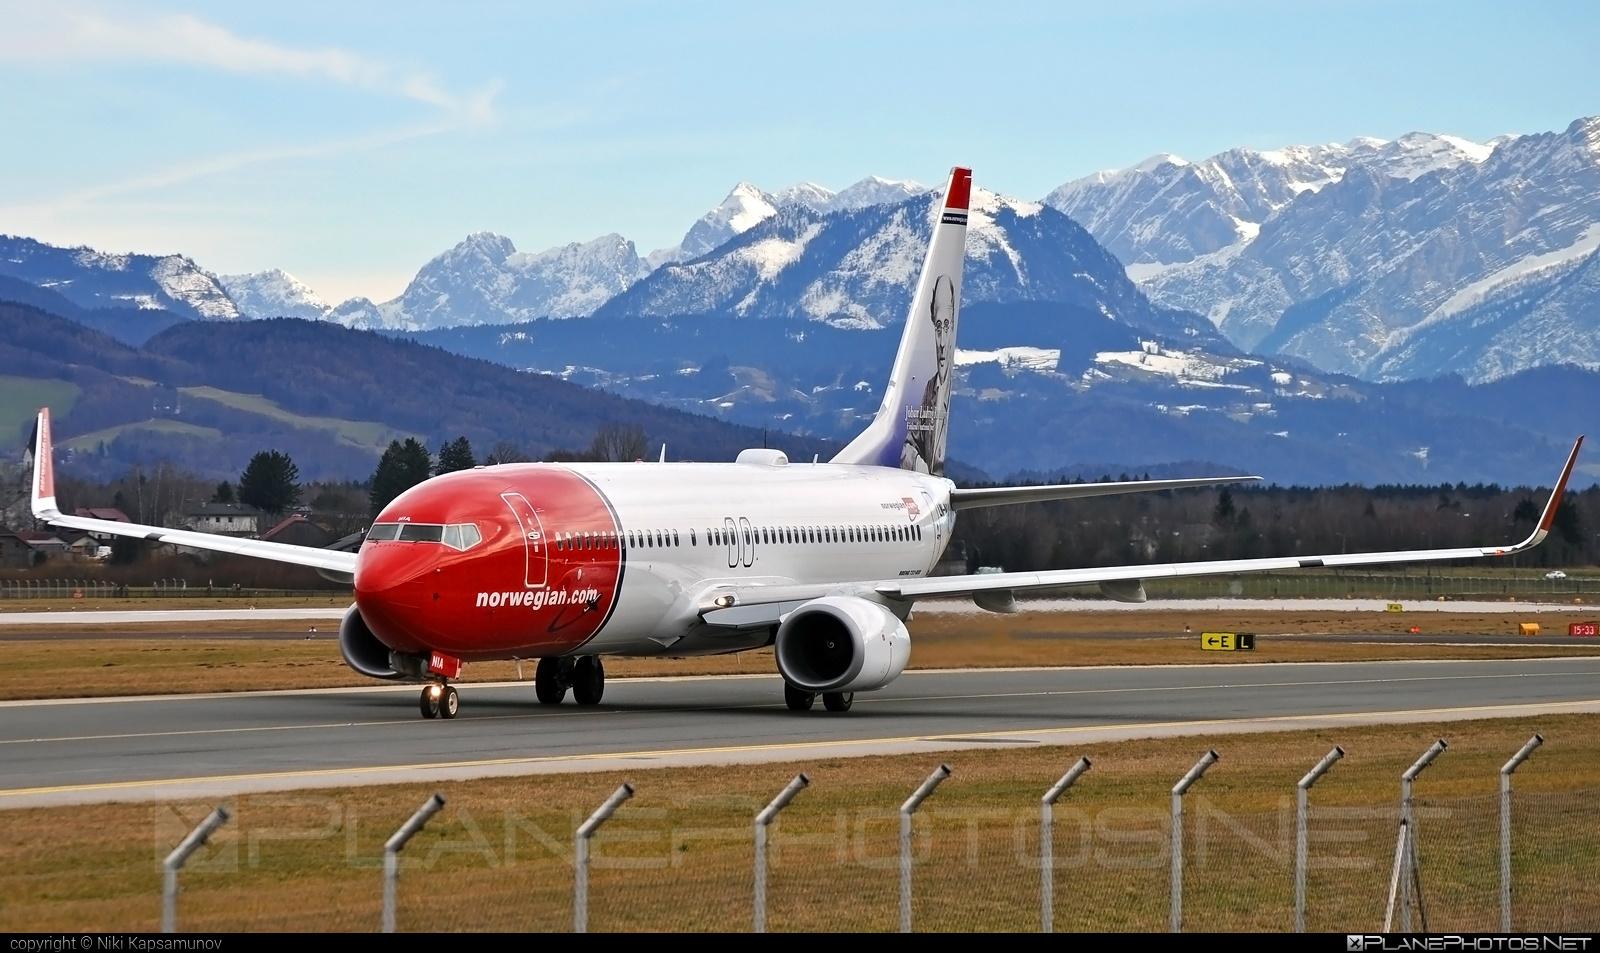 Boeing 737-800 - LN-NIA operated by Norwegian Air Shuttle #b737 #b737nextgen #b737ng #boeing #boeing737 #norwegian #norwegianair #norwegianairshuttle